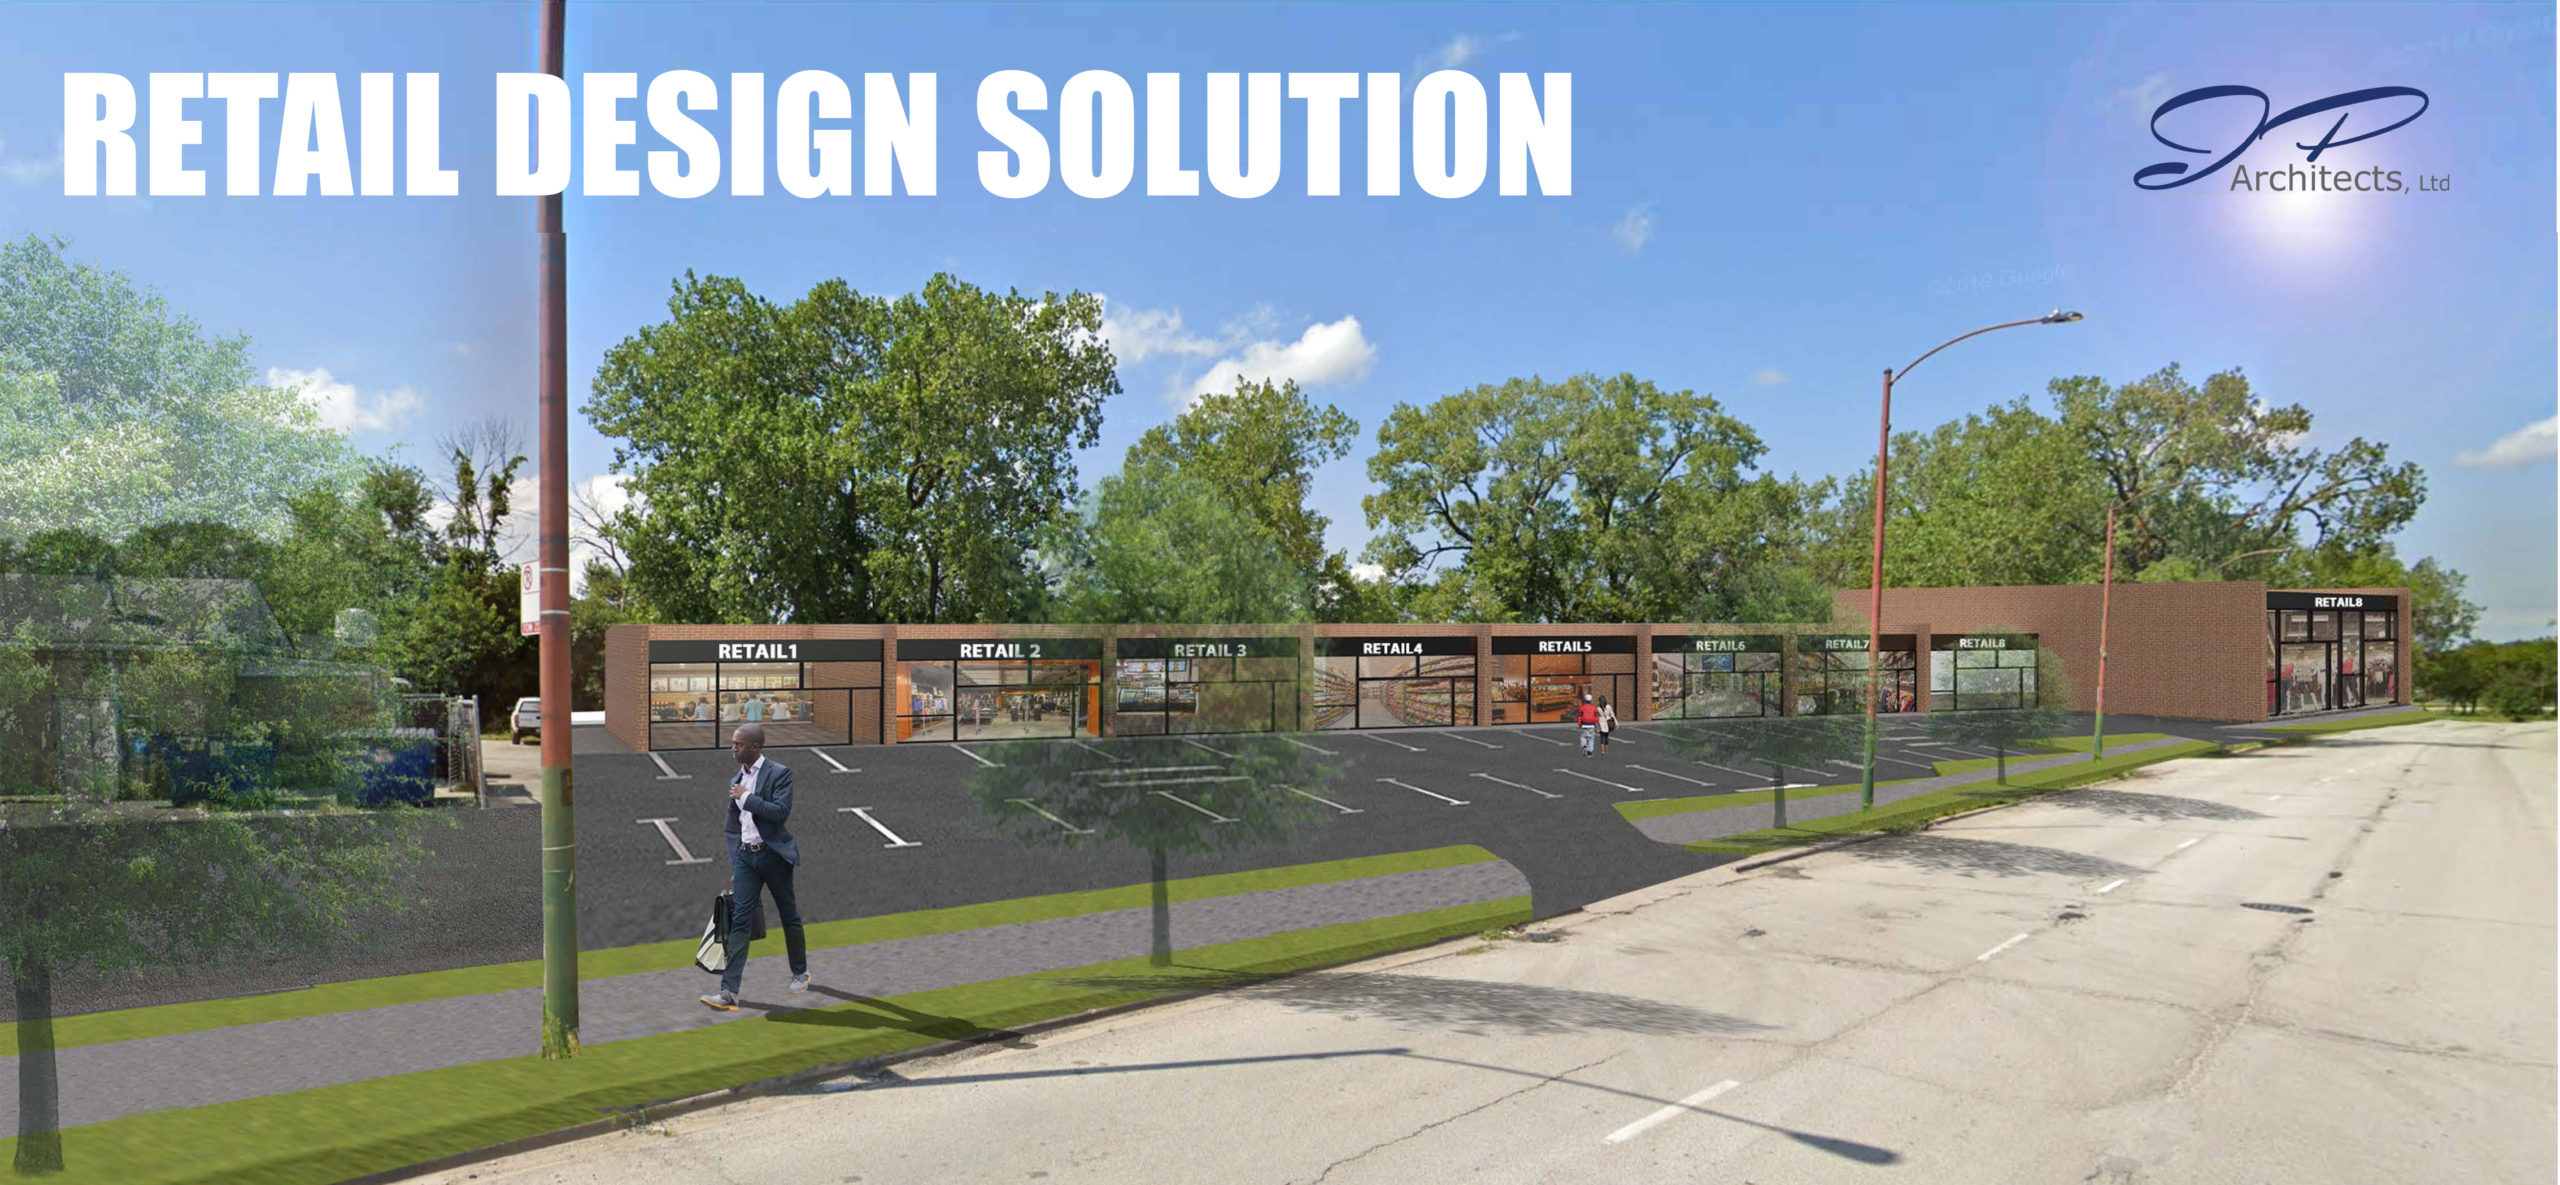 Retail Design Solution Cover Photo